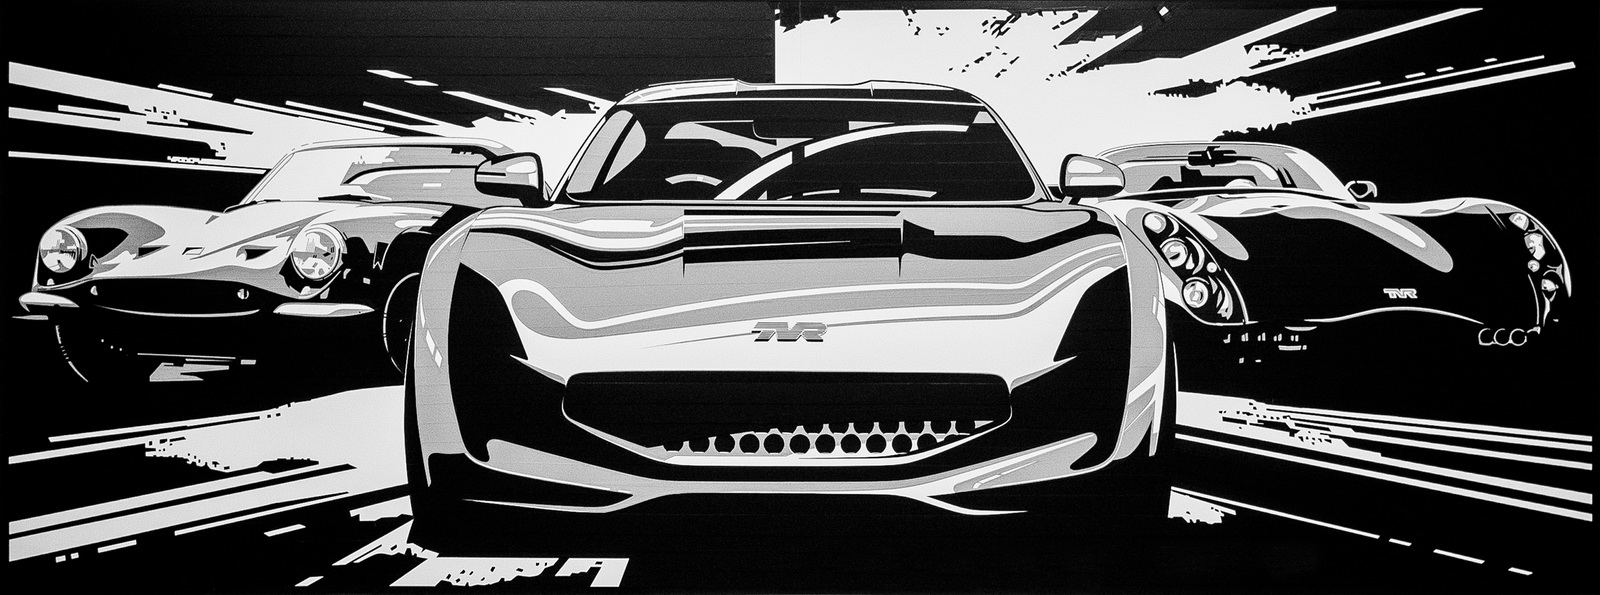 tvr to reveal new 200mph sportscar at goodwood revival. Black Bedroom Furniture Sets. Home Design Ideas